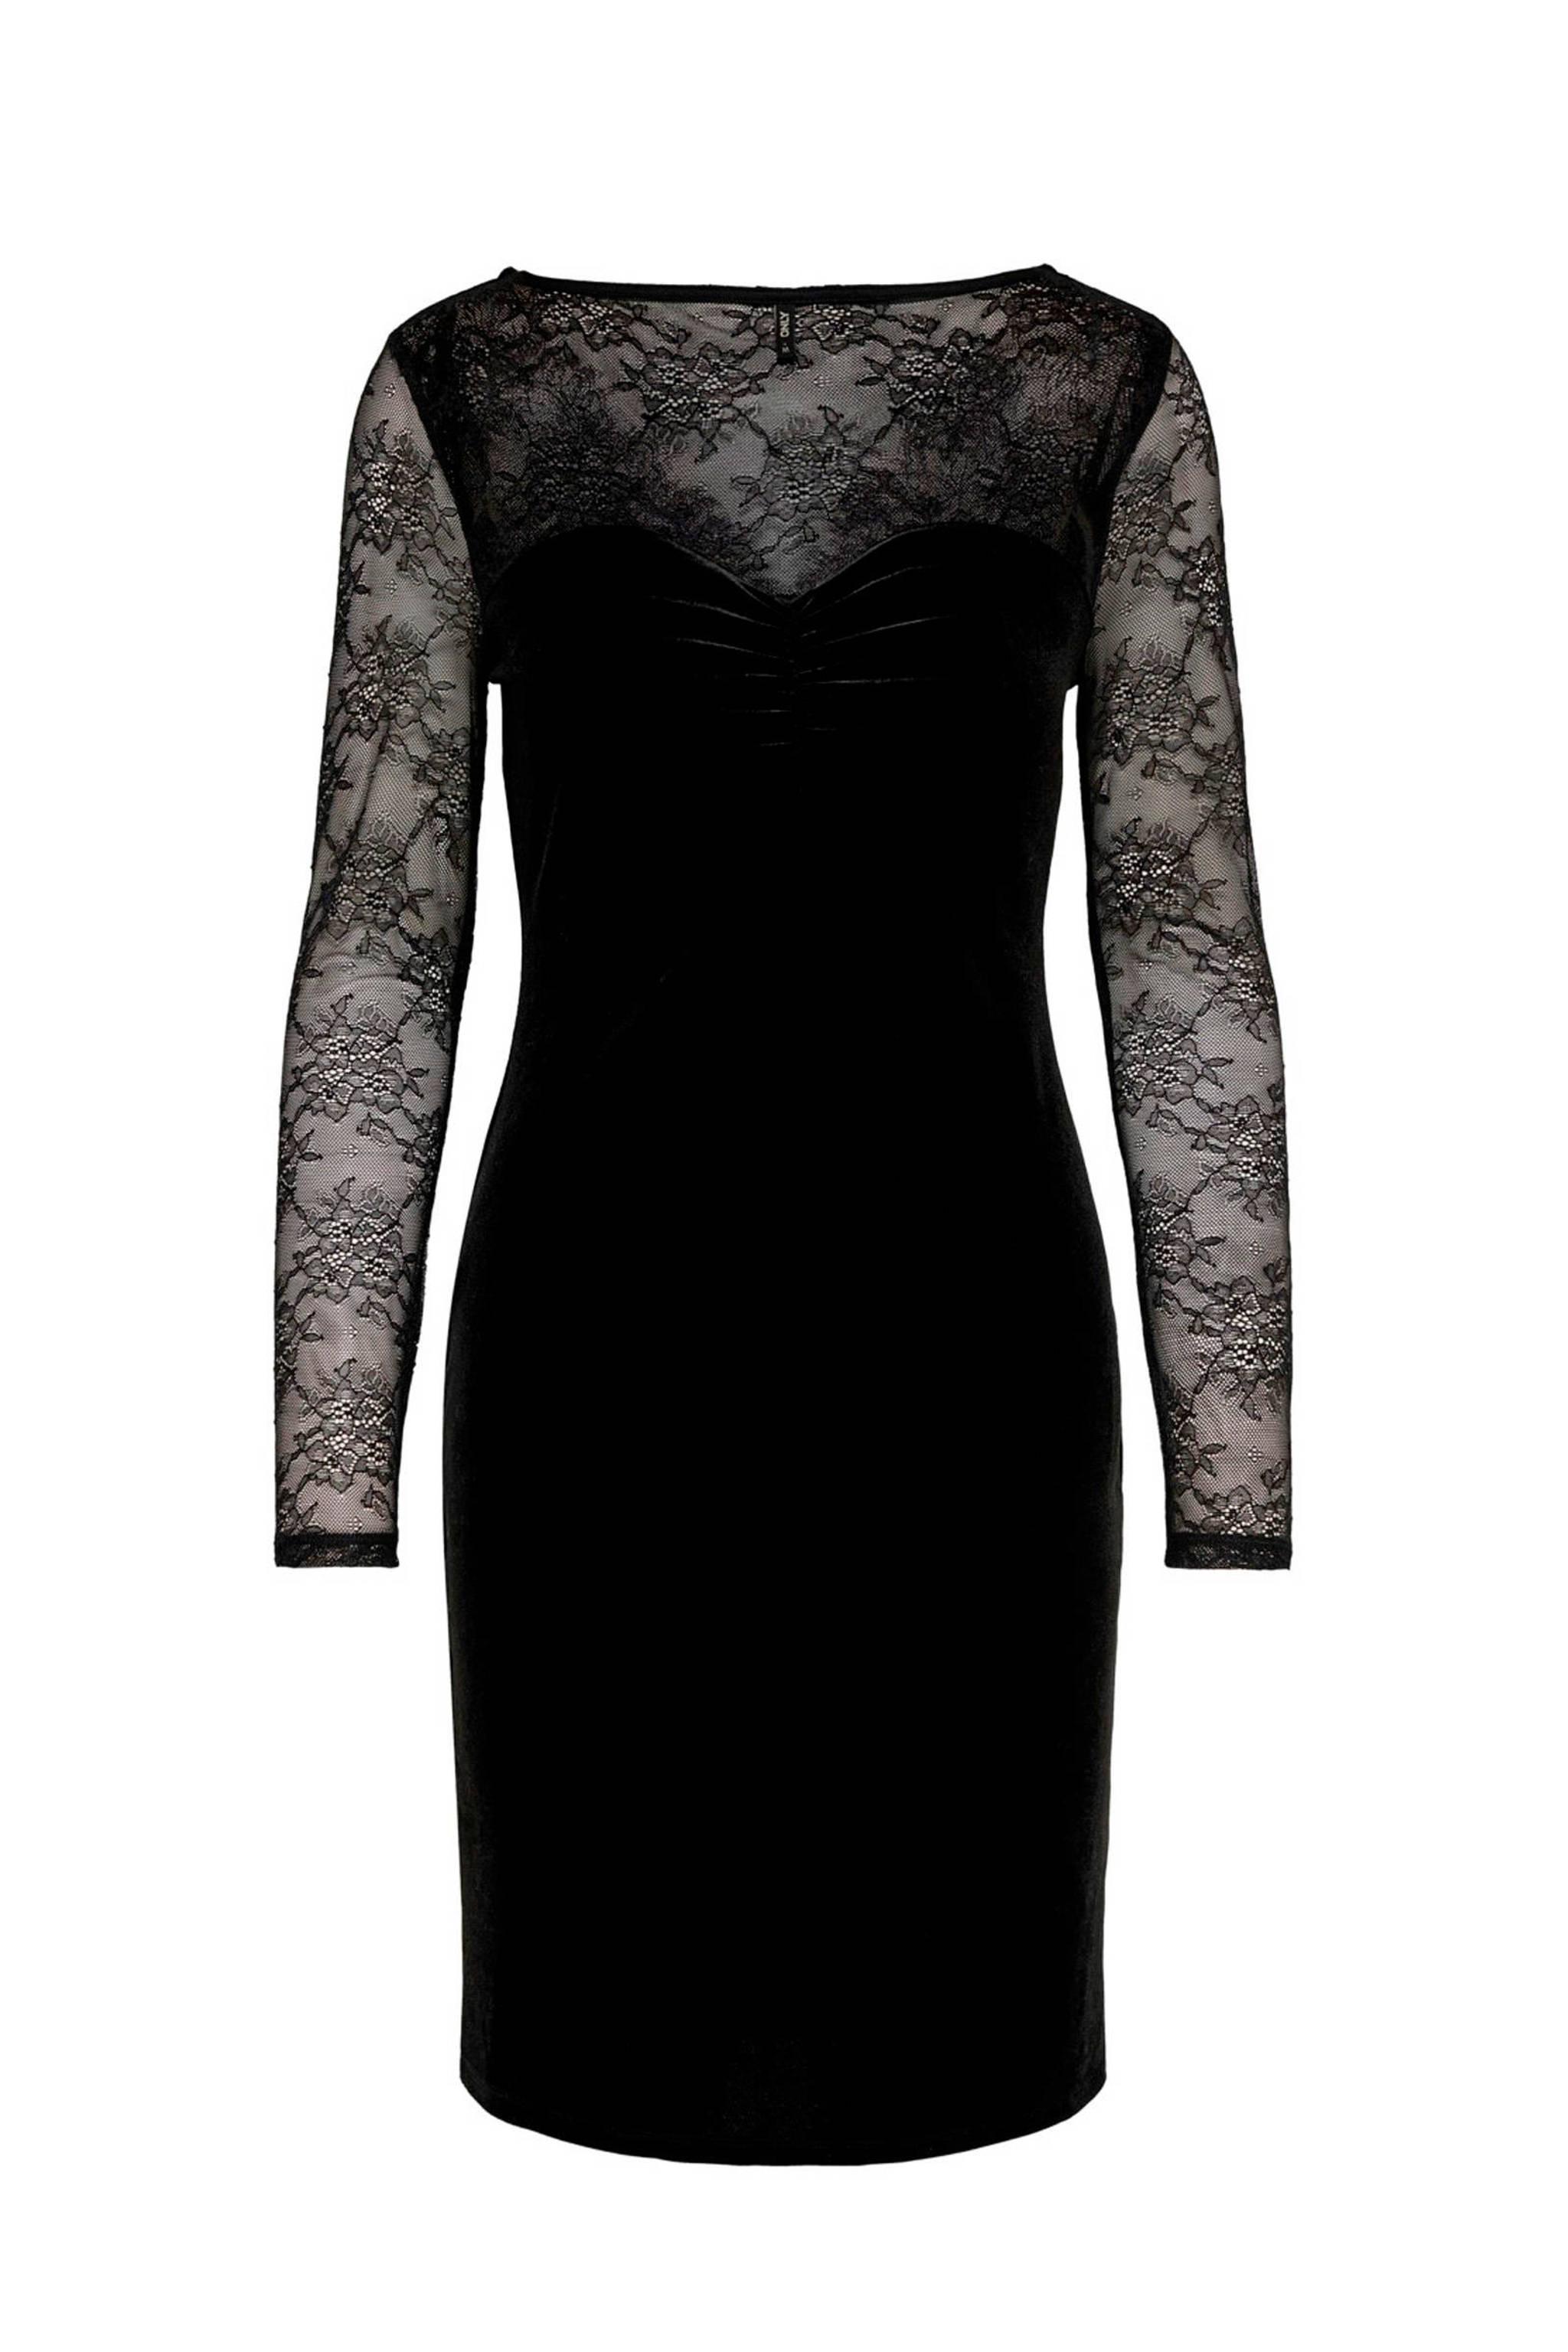 Ongekend ONLY fluwelen jurk met kant zwart | wehkamp XM-91